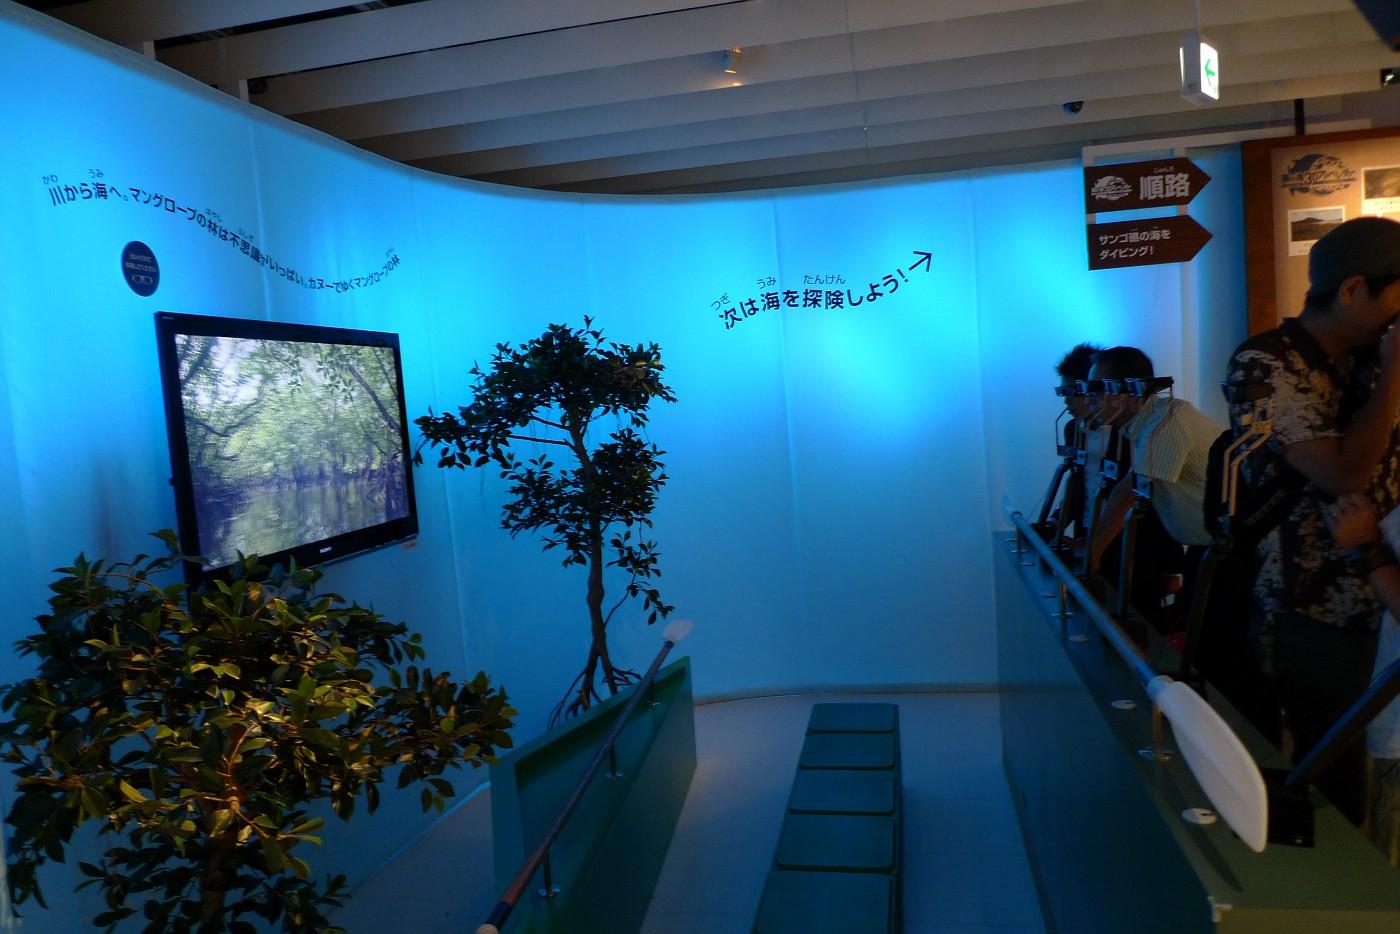 Прогулка с фотоаппаратом по Токийскому Sony Show Room